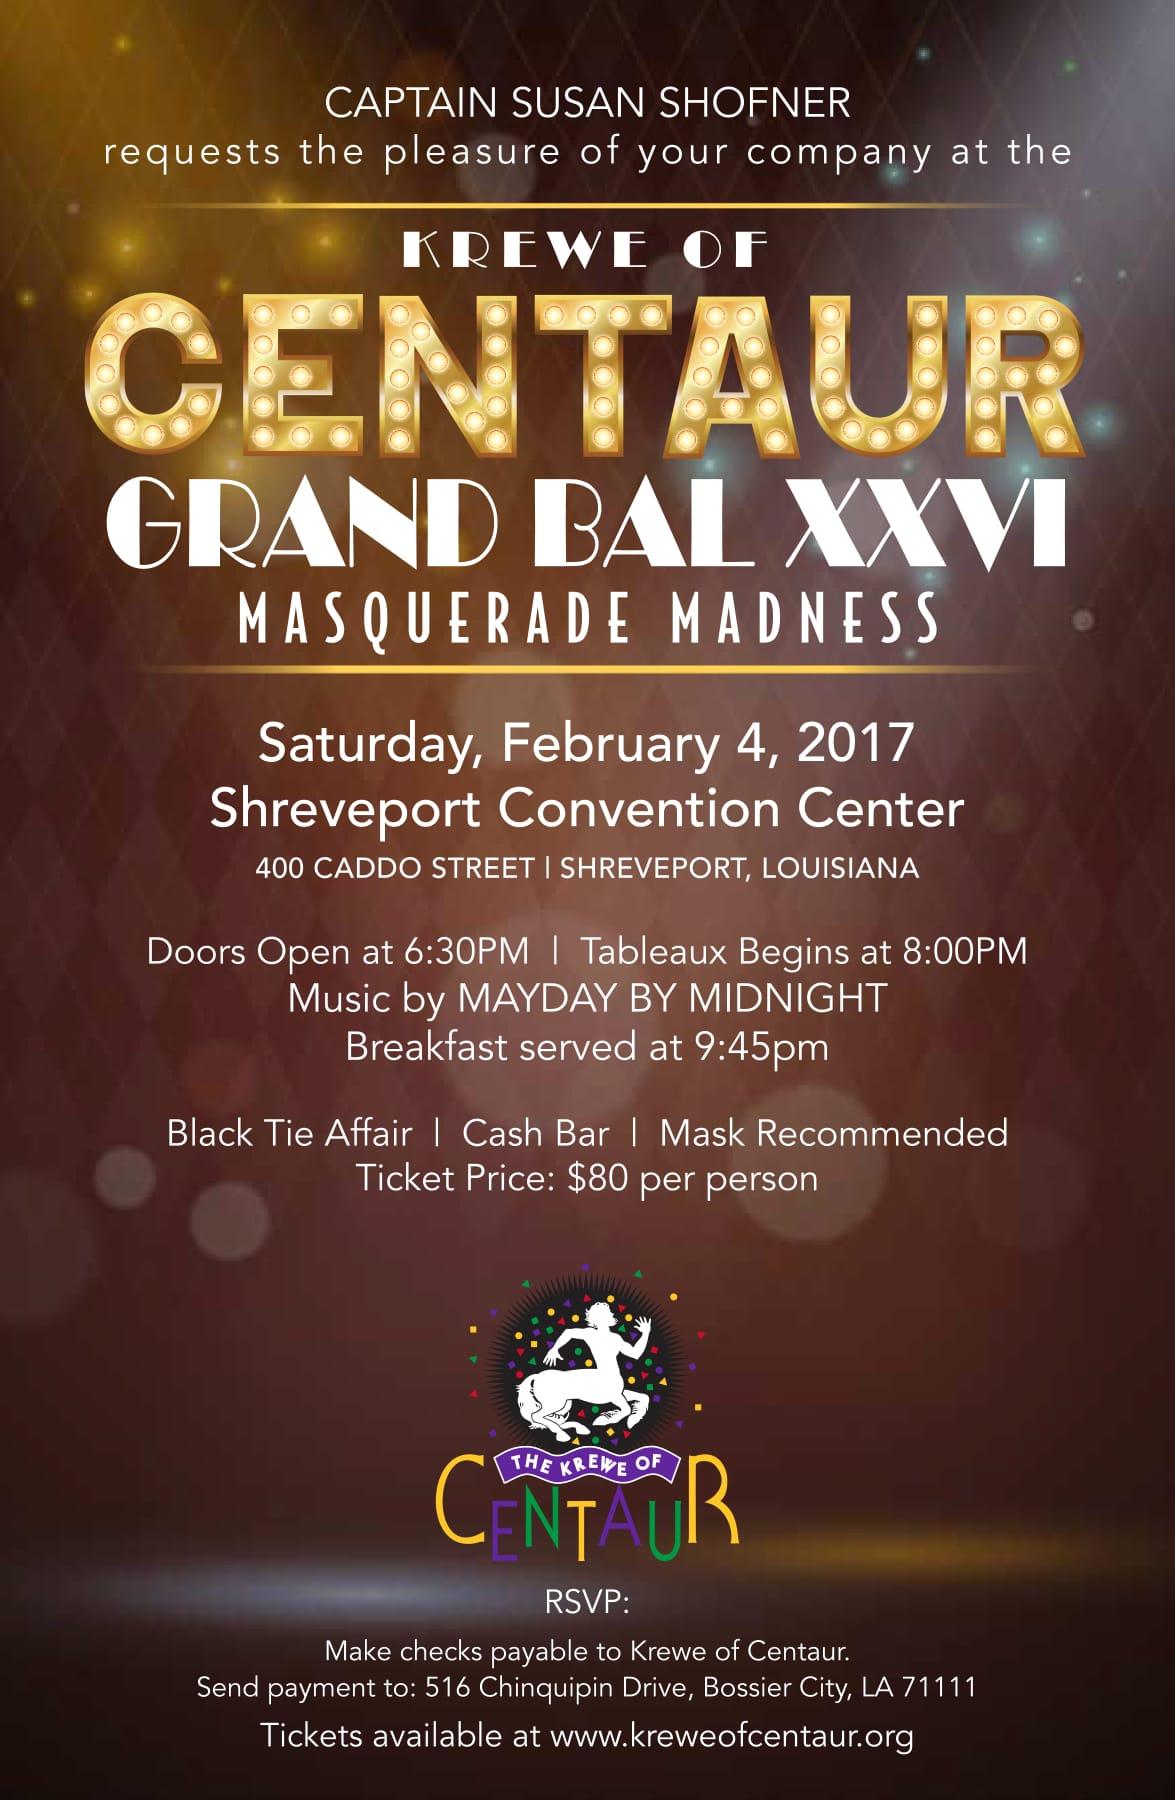 grand-bal-xxvi-invite-2